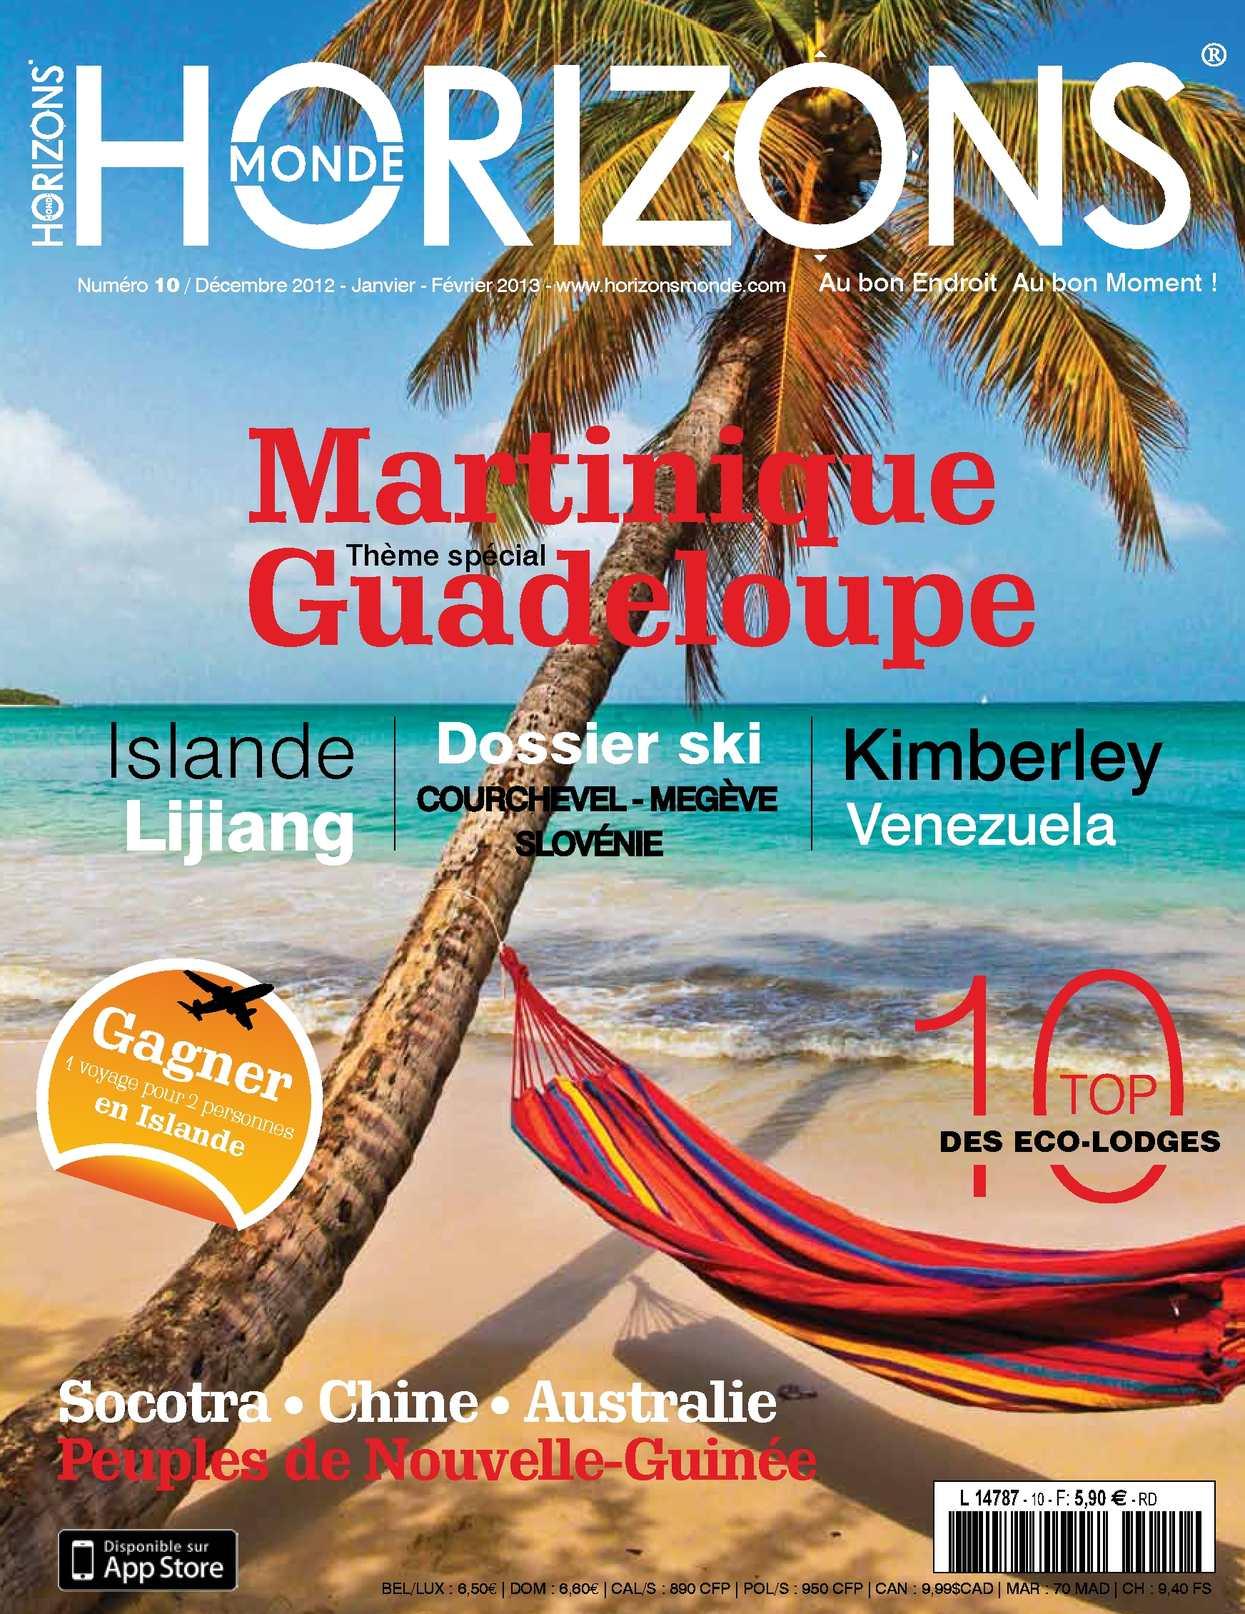 HORIZONS MONDE N°10 hiver 2012/2013